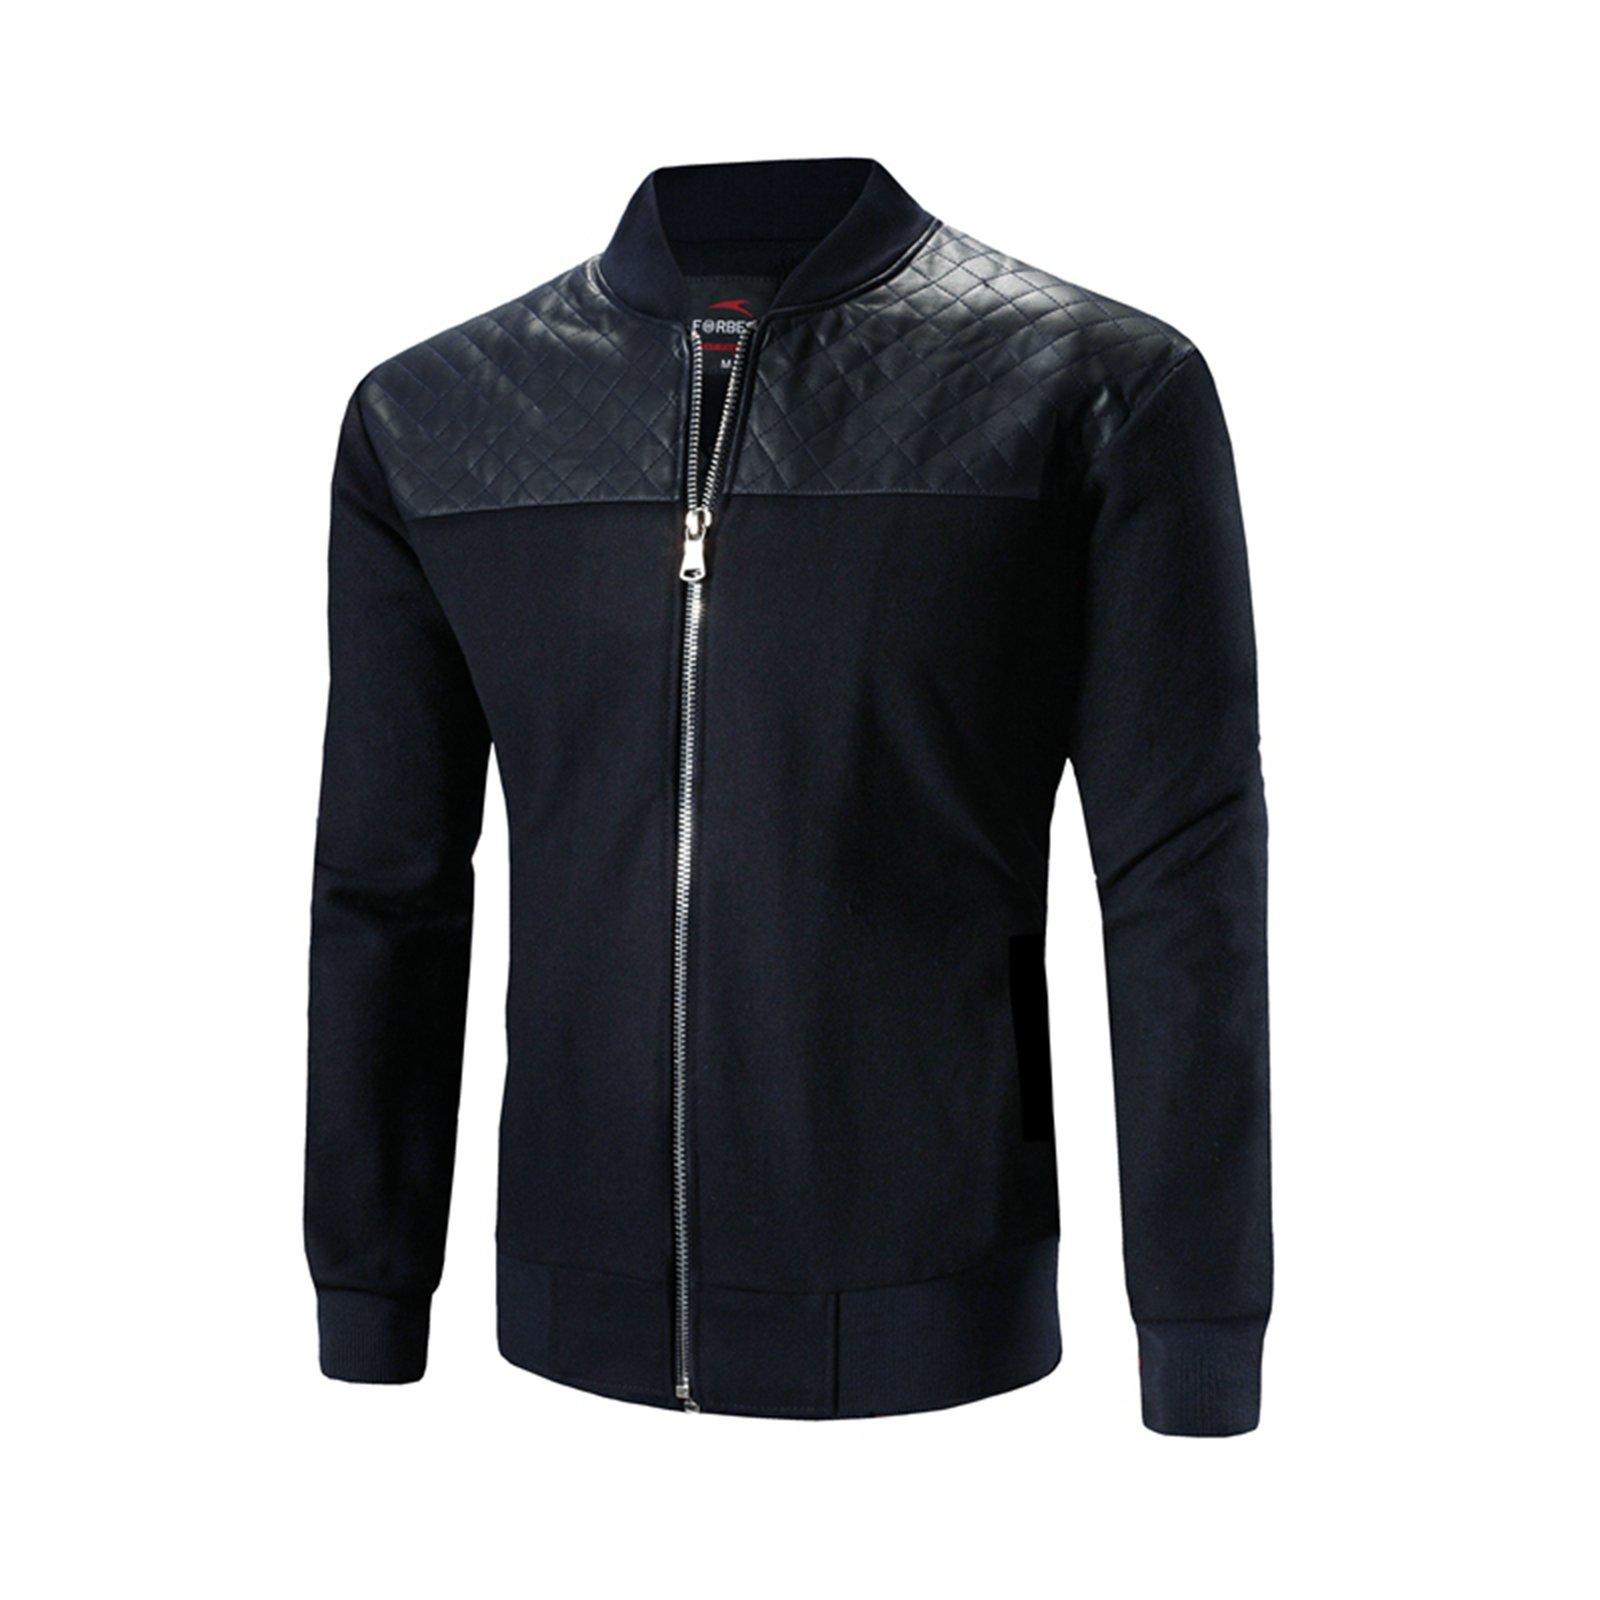 Stuff Autumn Winter Baseball Jacket Men Design Black Pu Leather Splice Mens Slim Fit Boy Jacket (M)